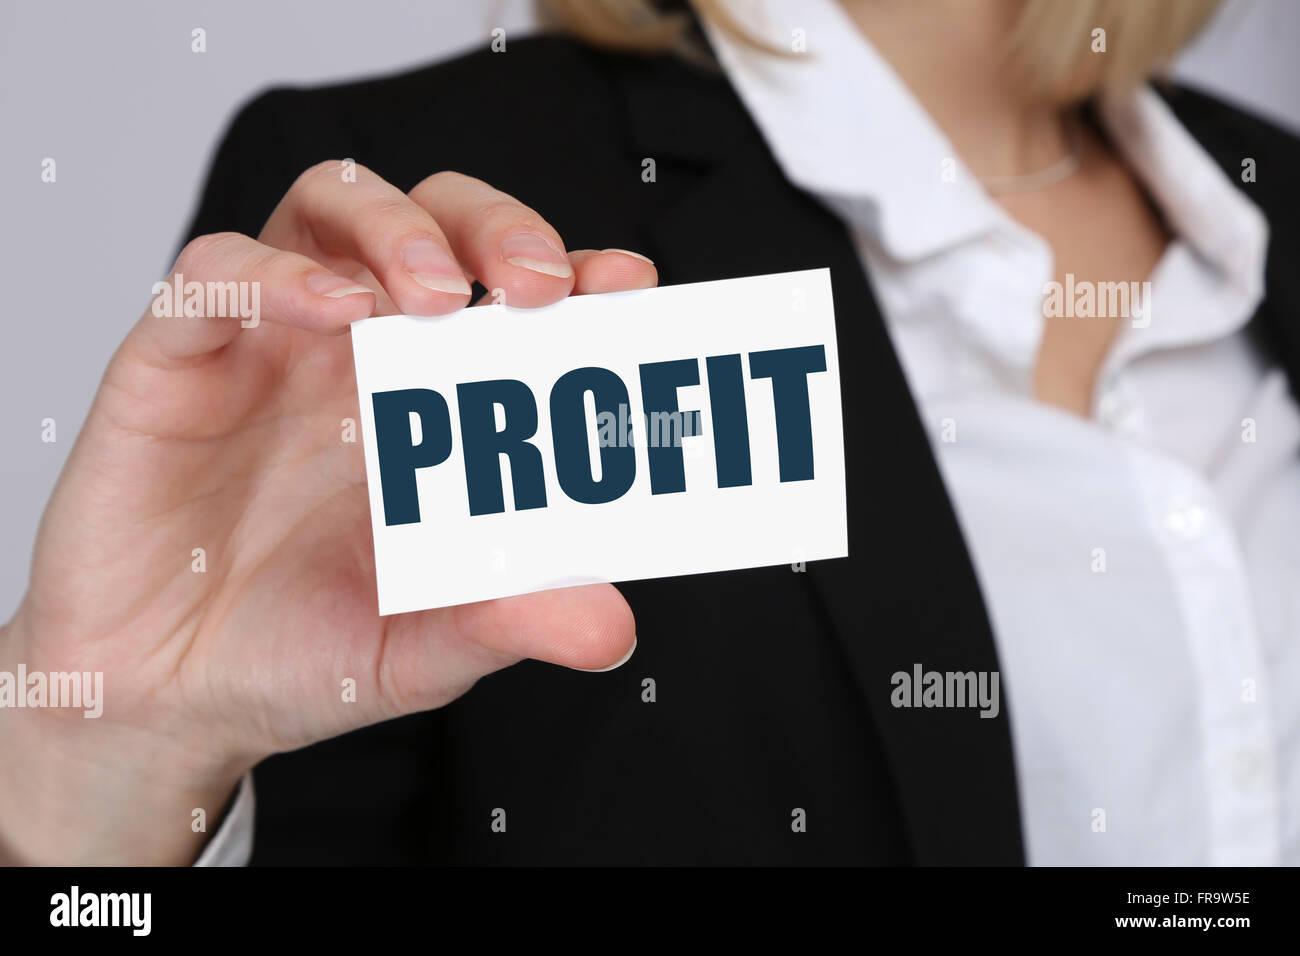 Profit leadership financial success business concept successful - Stock Image